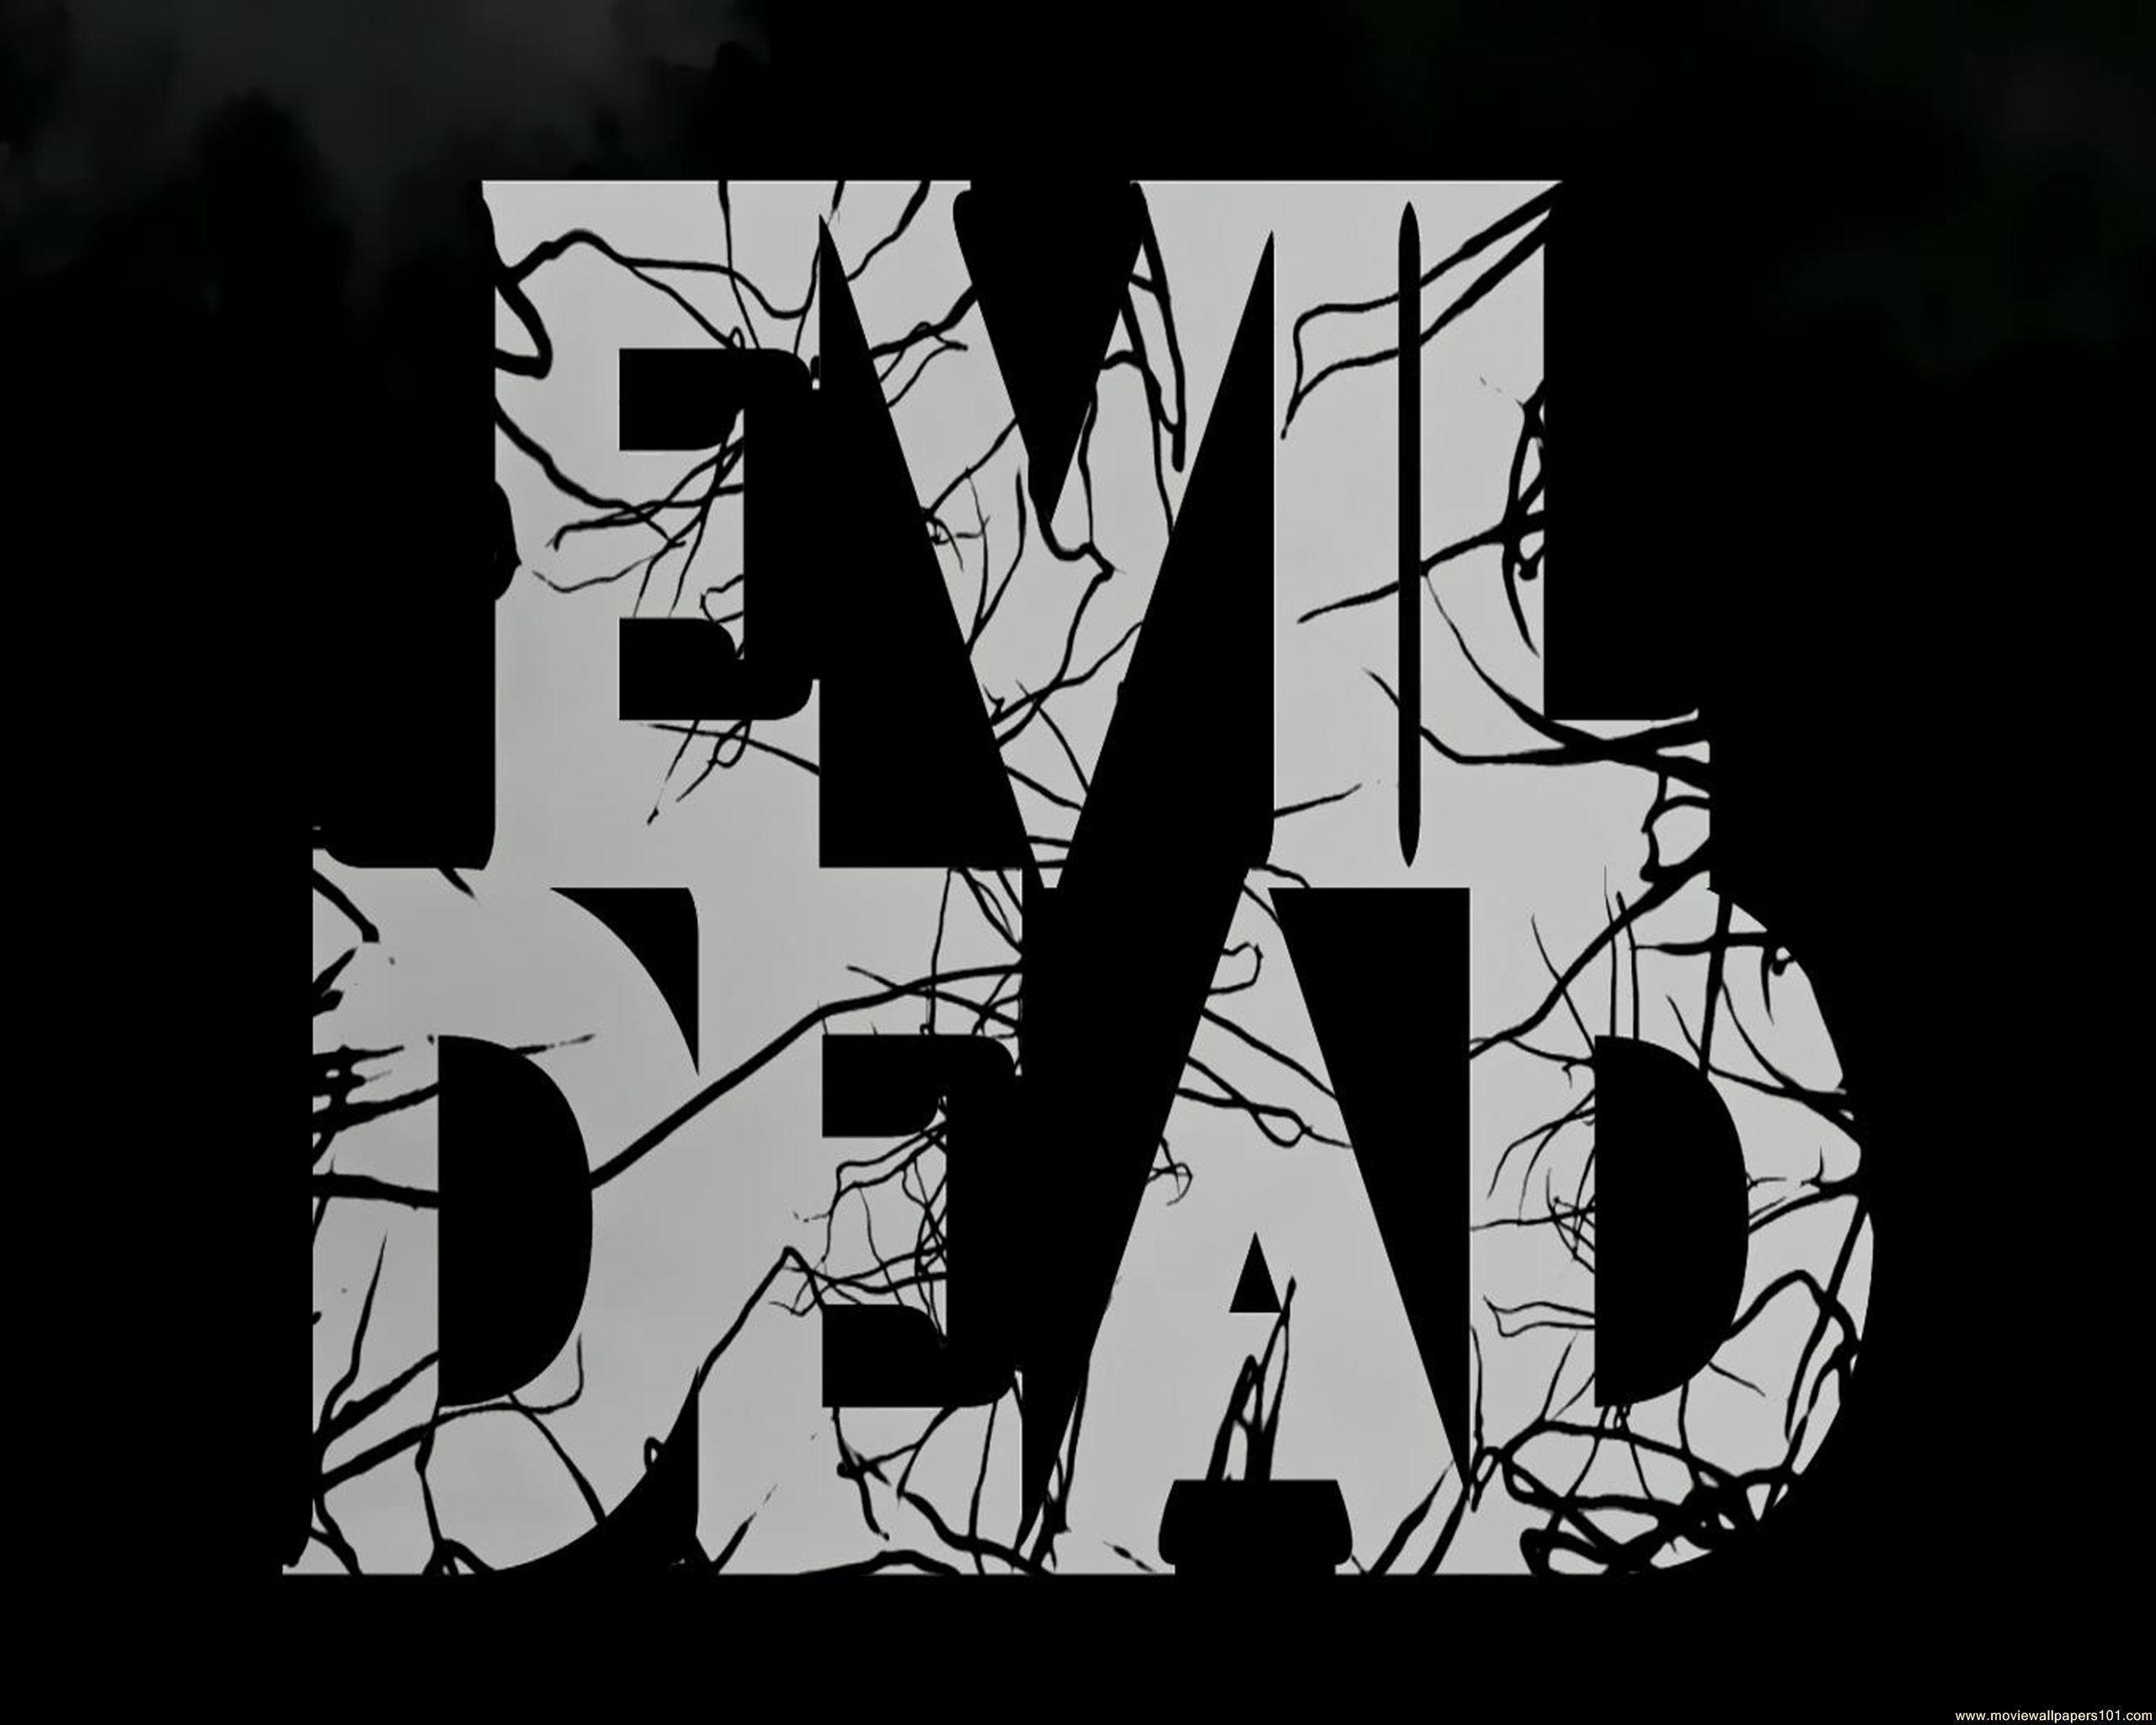 evil dead wallpaper 1920x1080 - photo #25